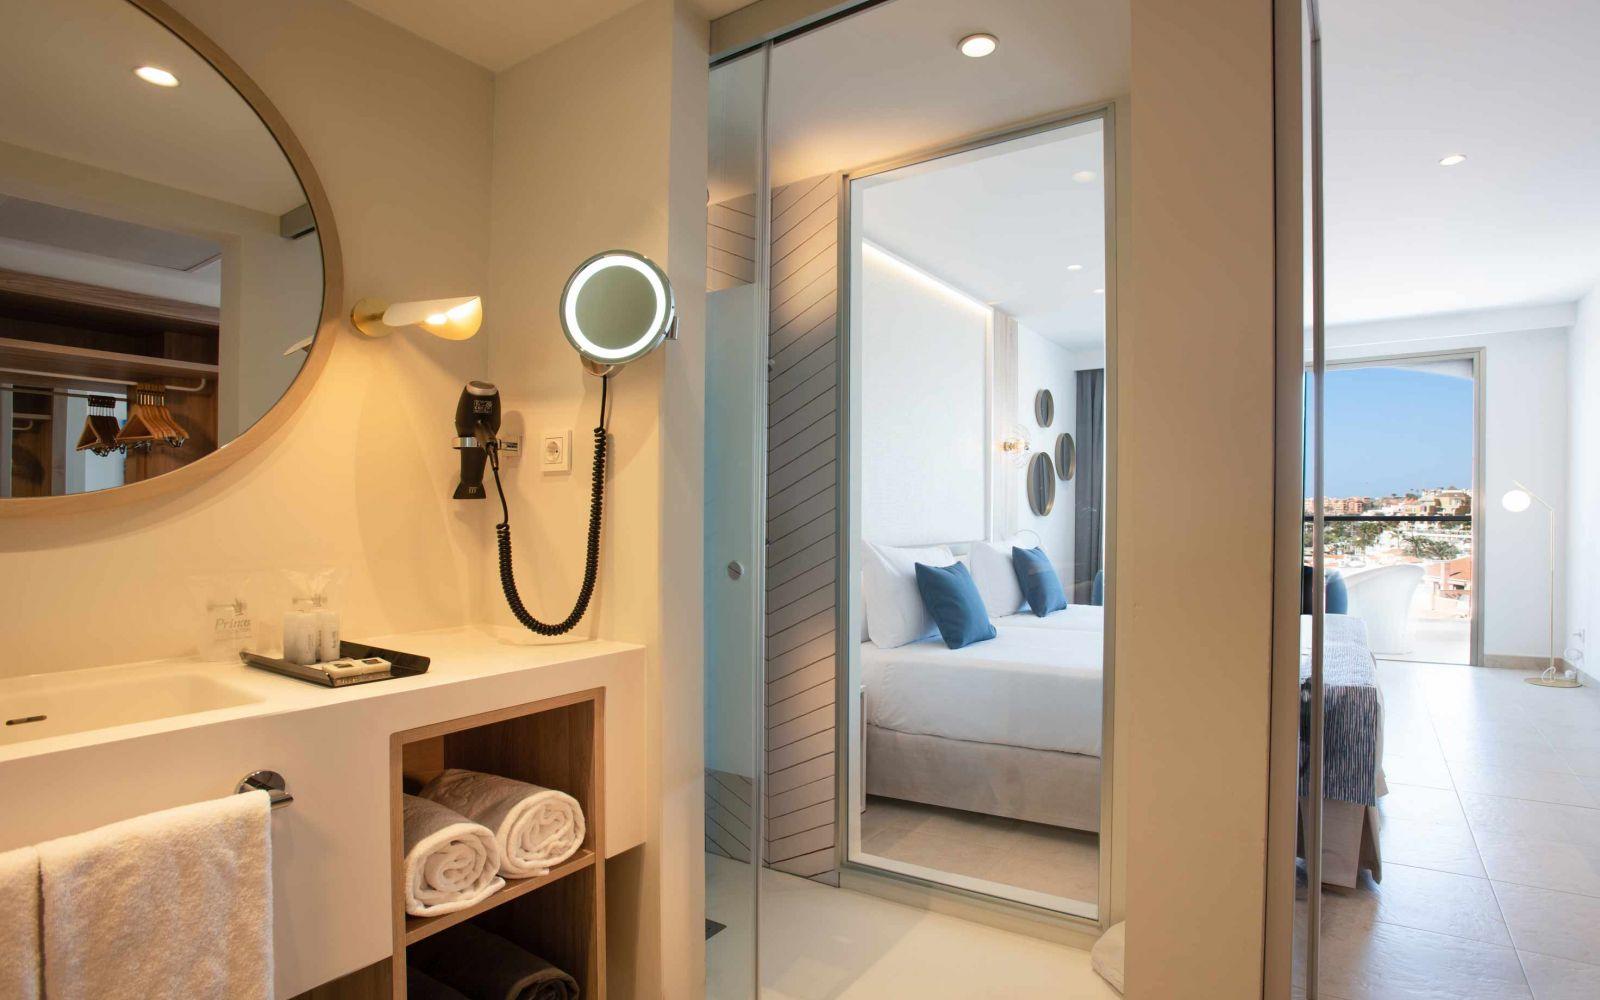 Guayarmina-Princess-Standard-Double-Room-A140_0